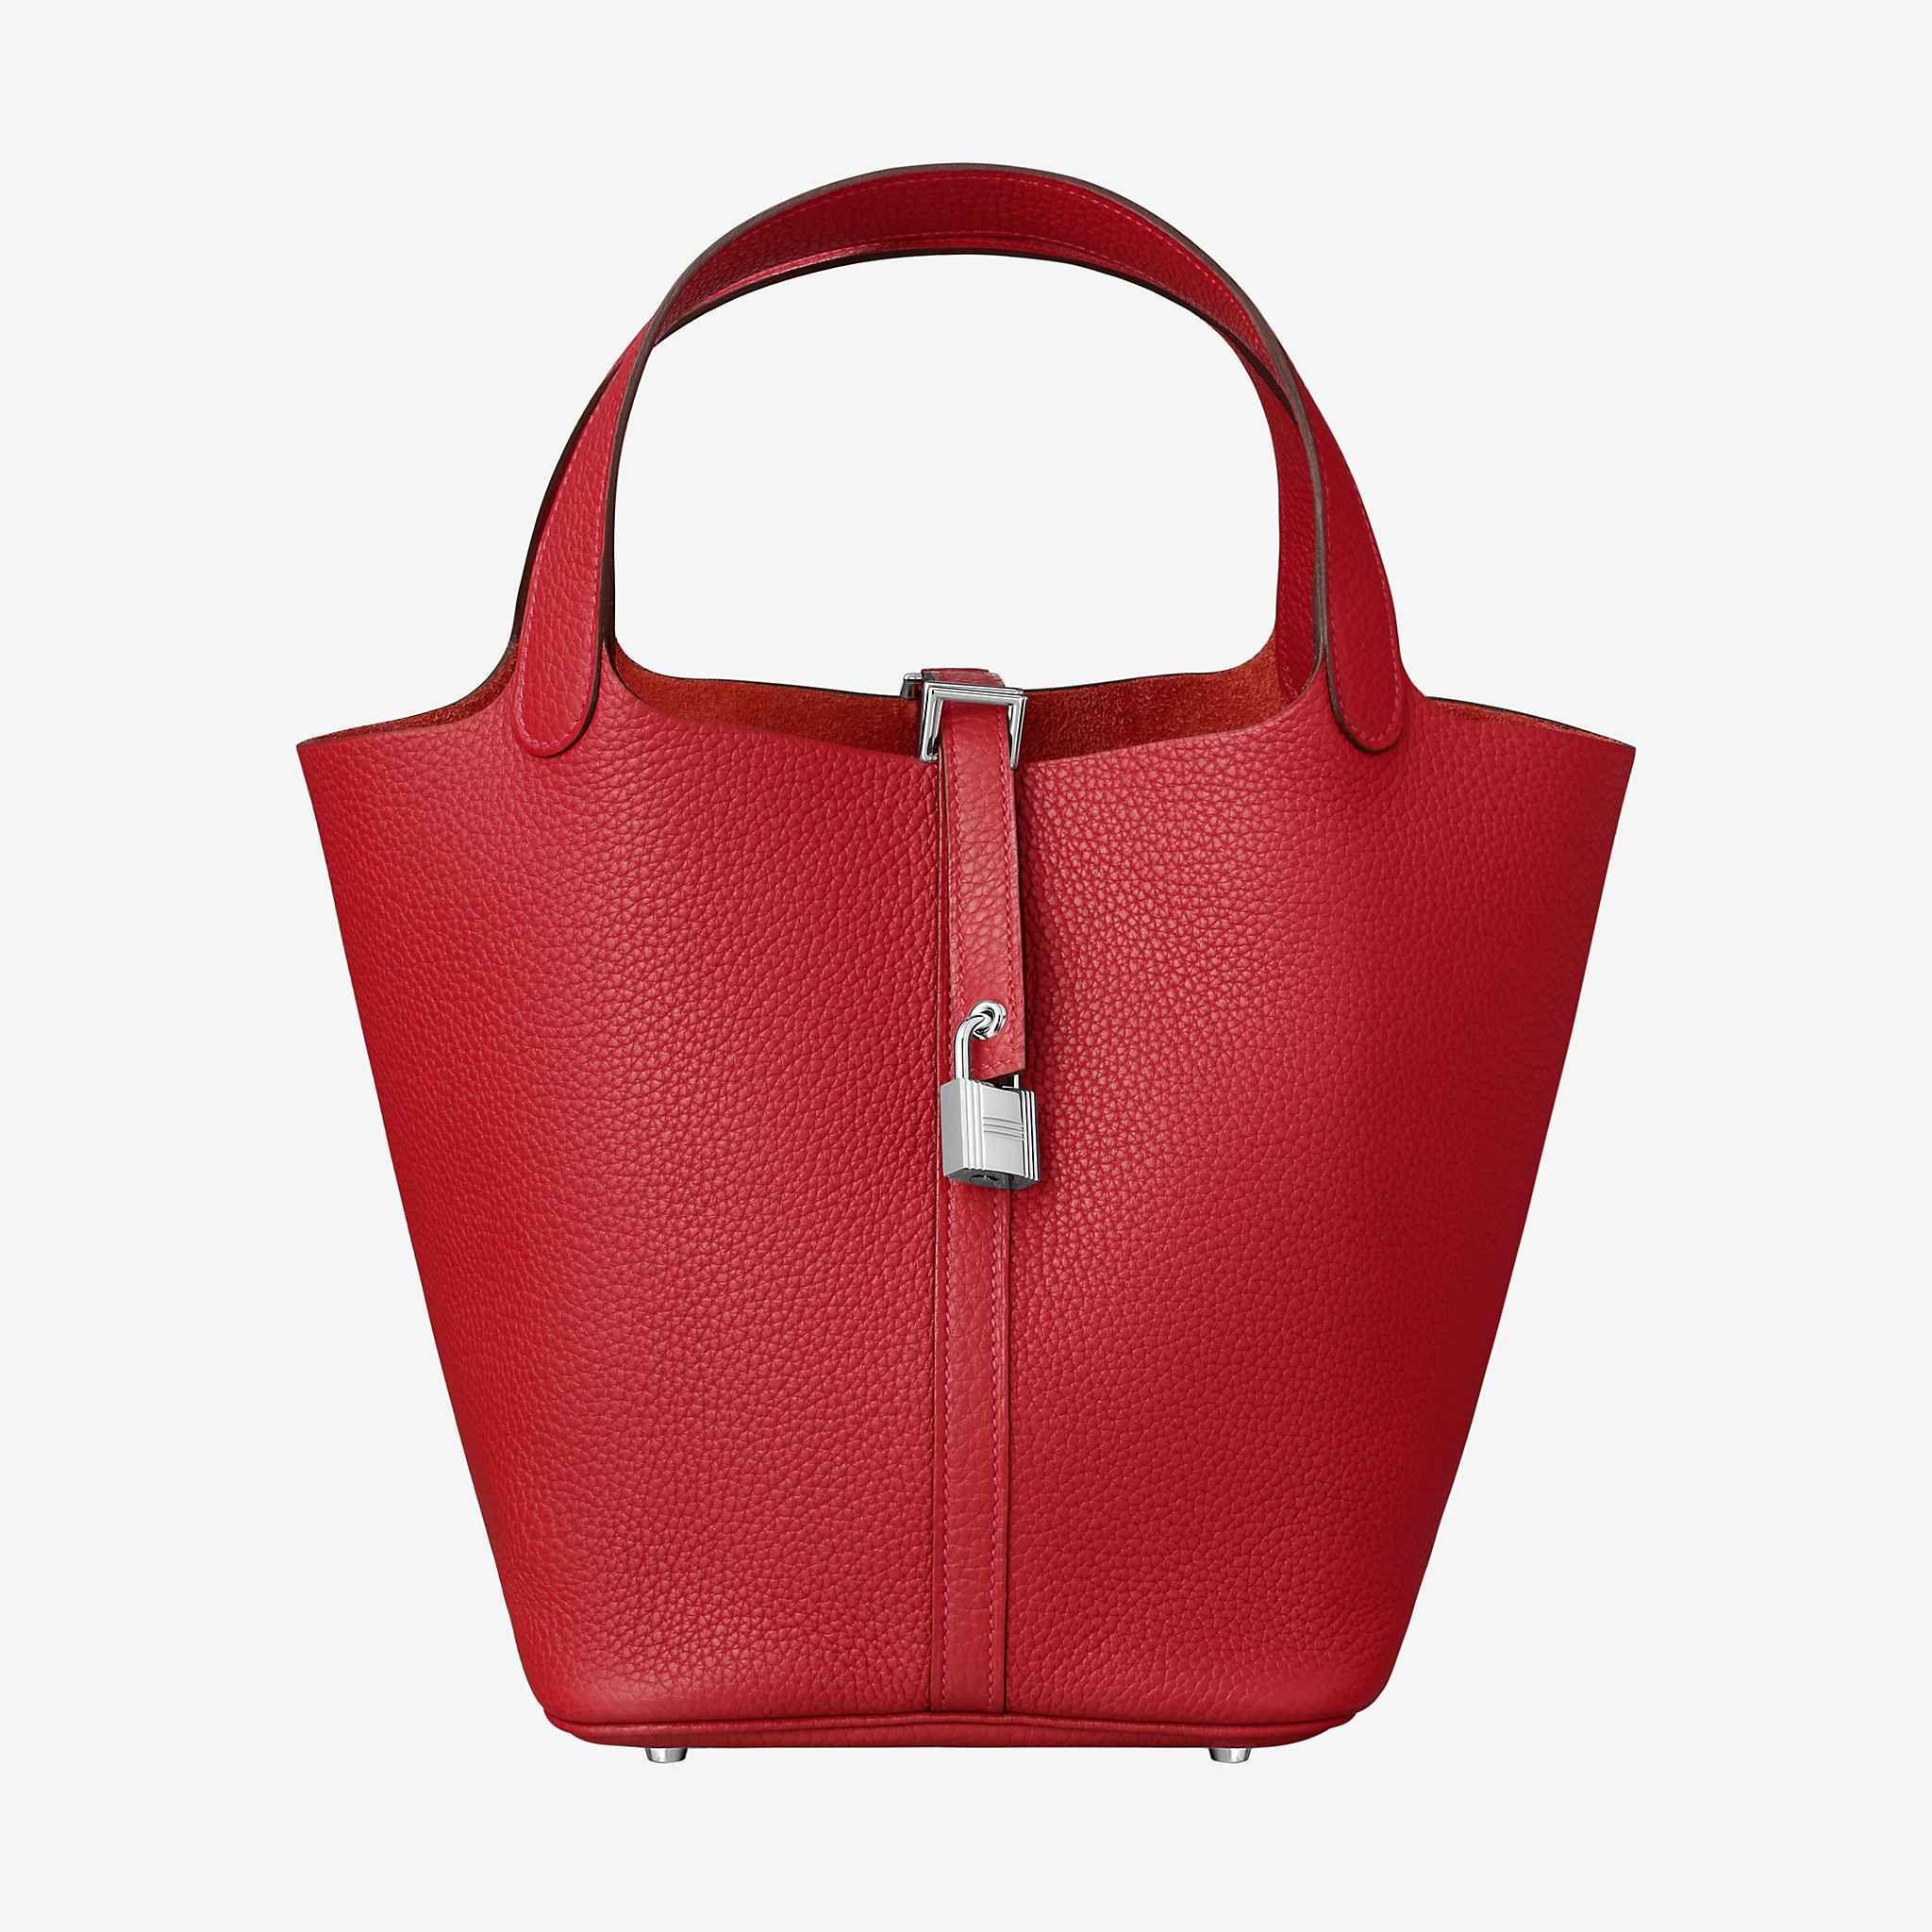 a079a1ecd172 Picotin Lock 22 bag